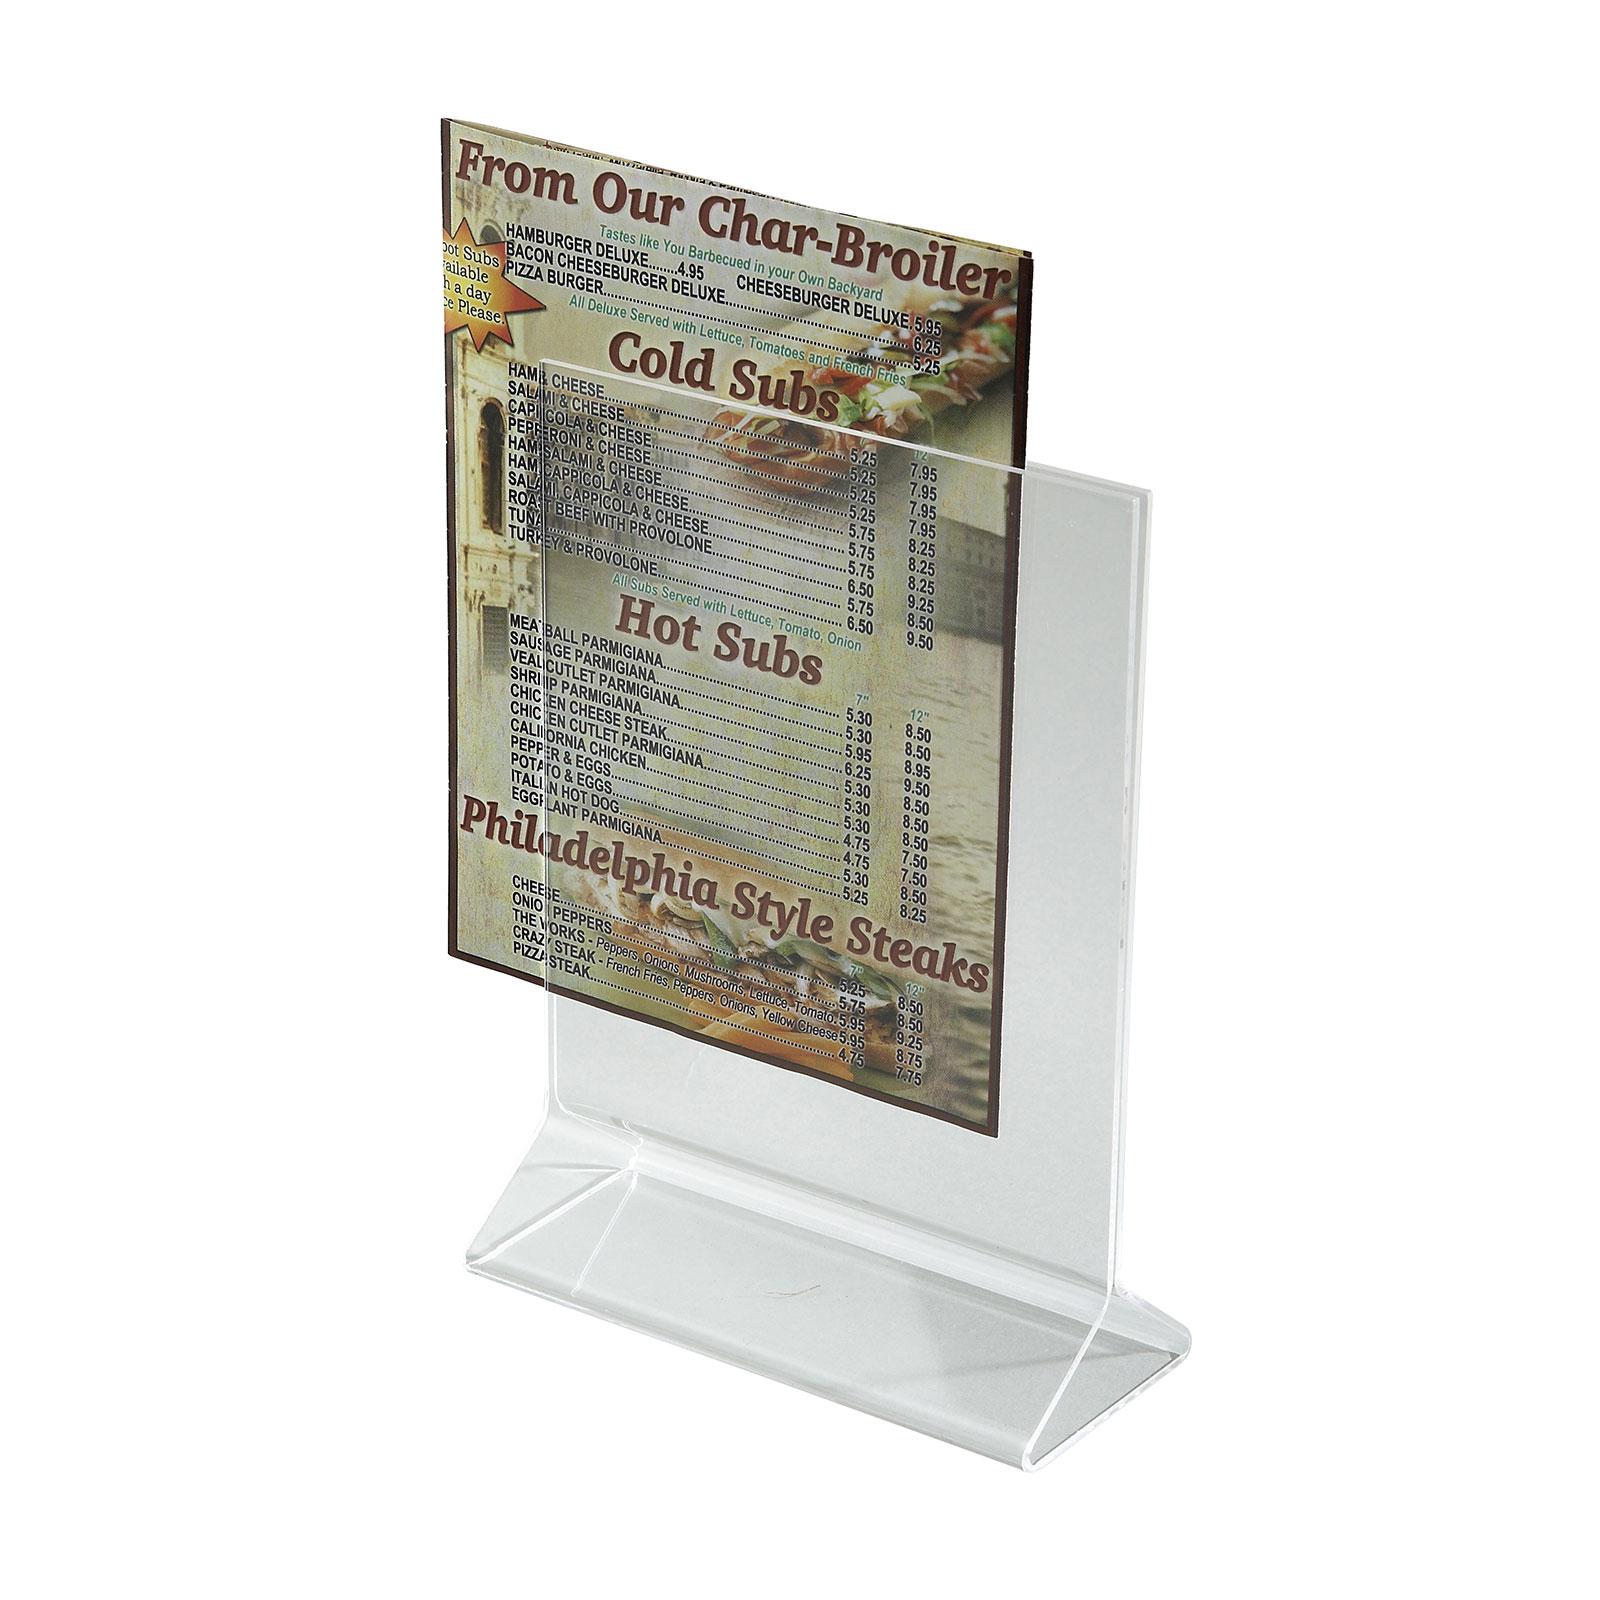 Winco ATCH-57 menu card holder / number stand